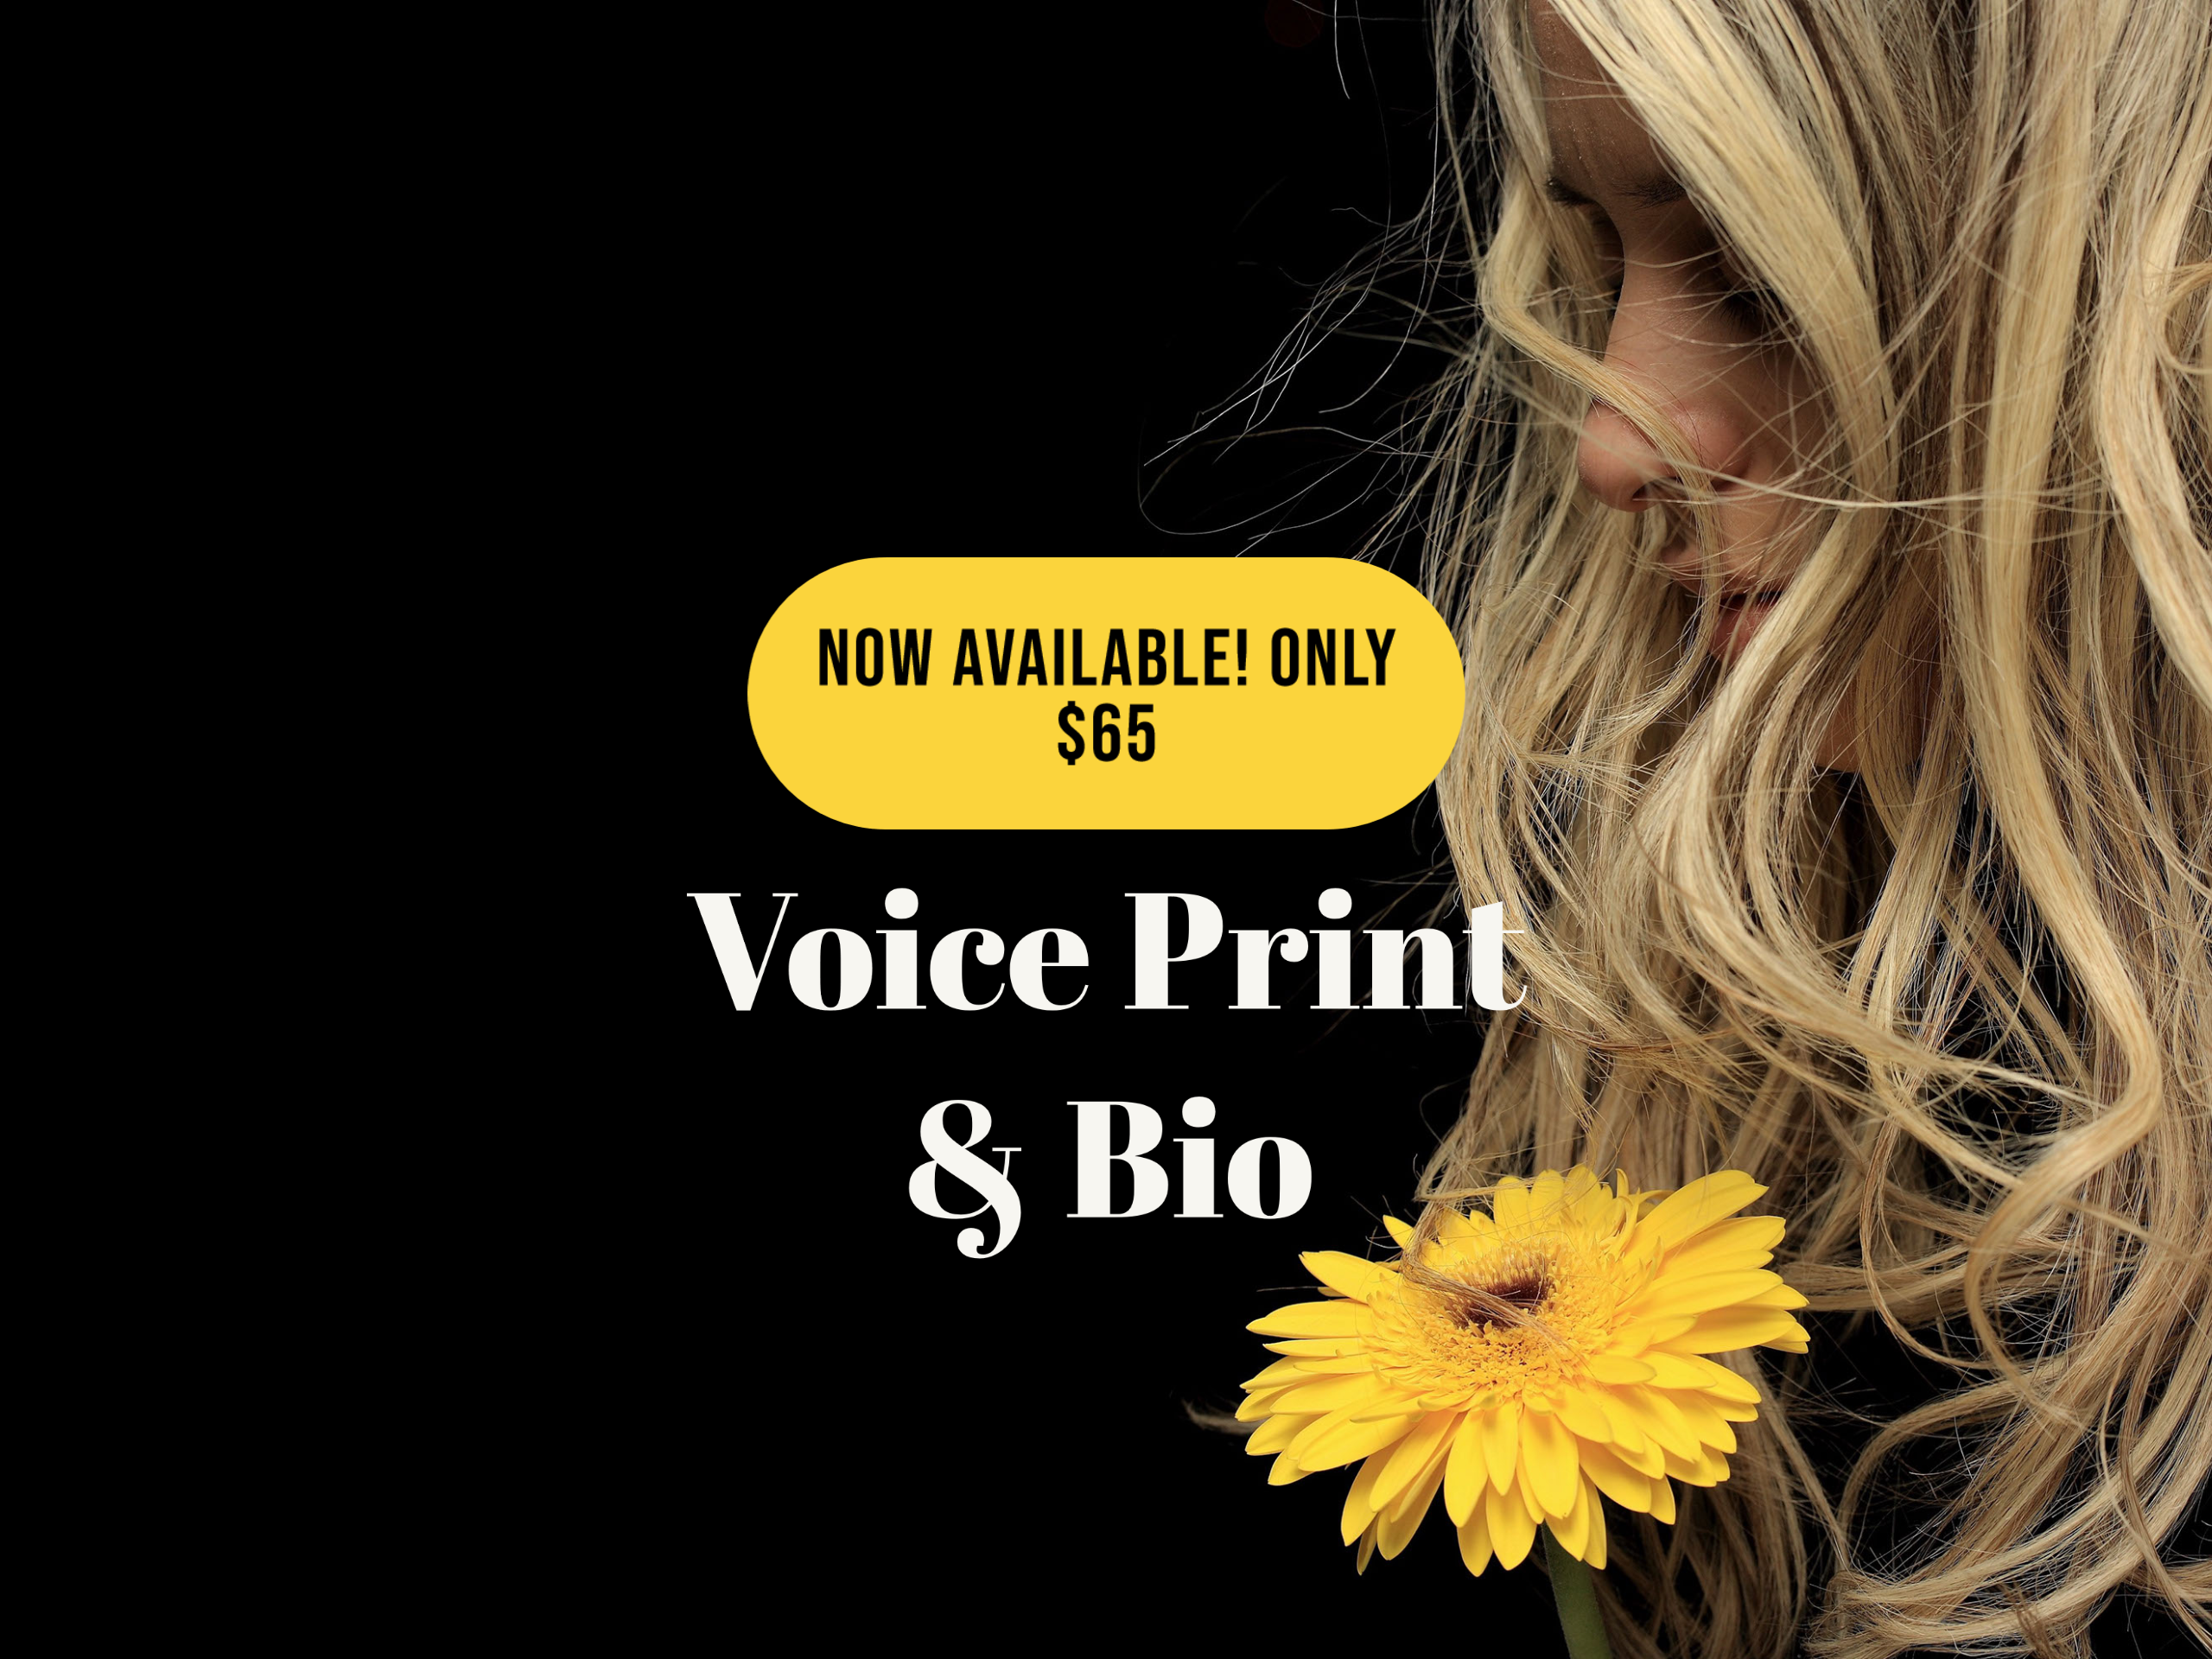 Voice Print & Bio